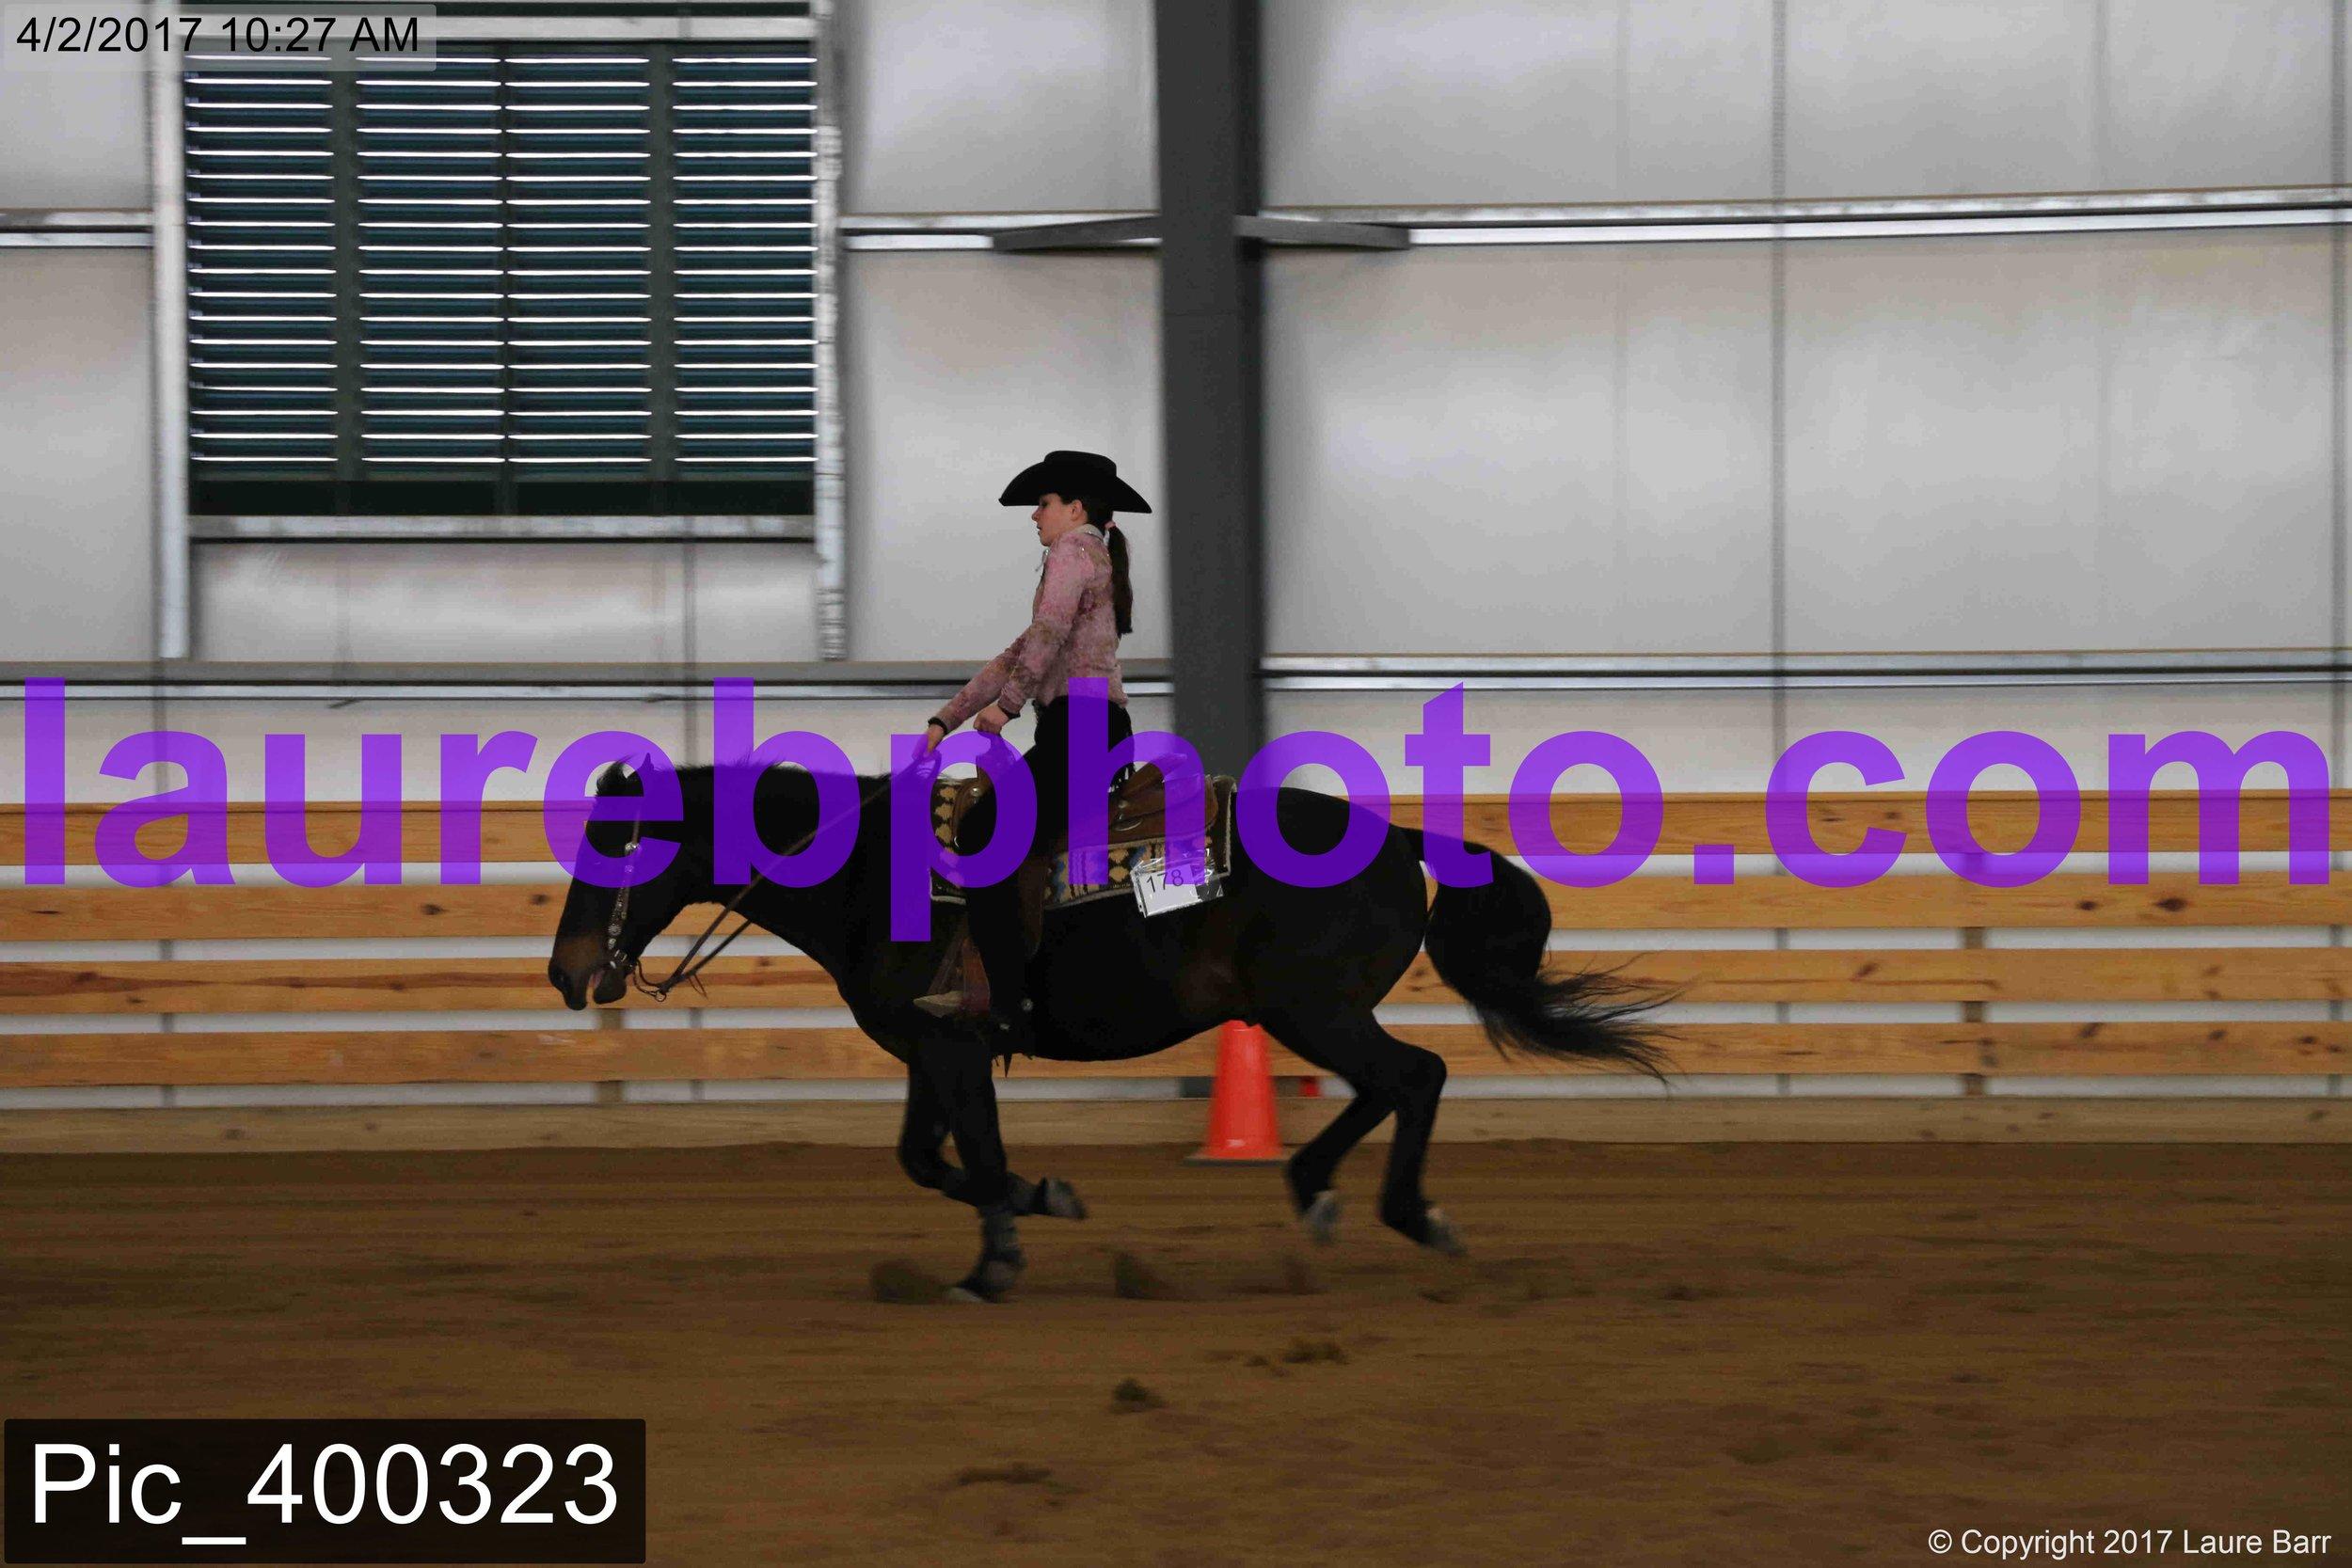 Pic_400323.jpg